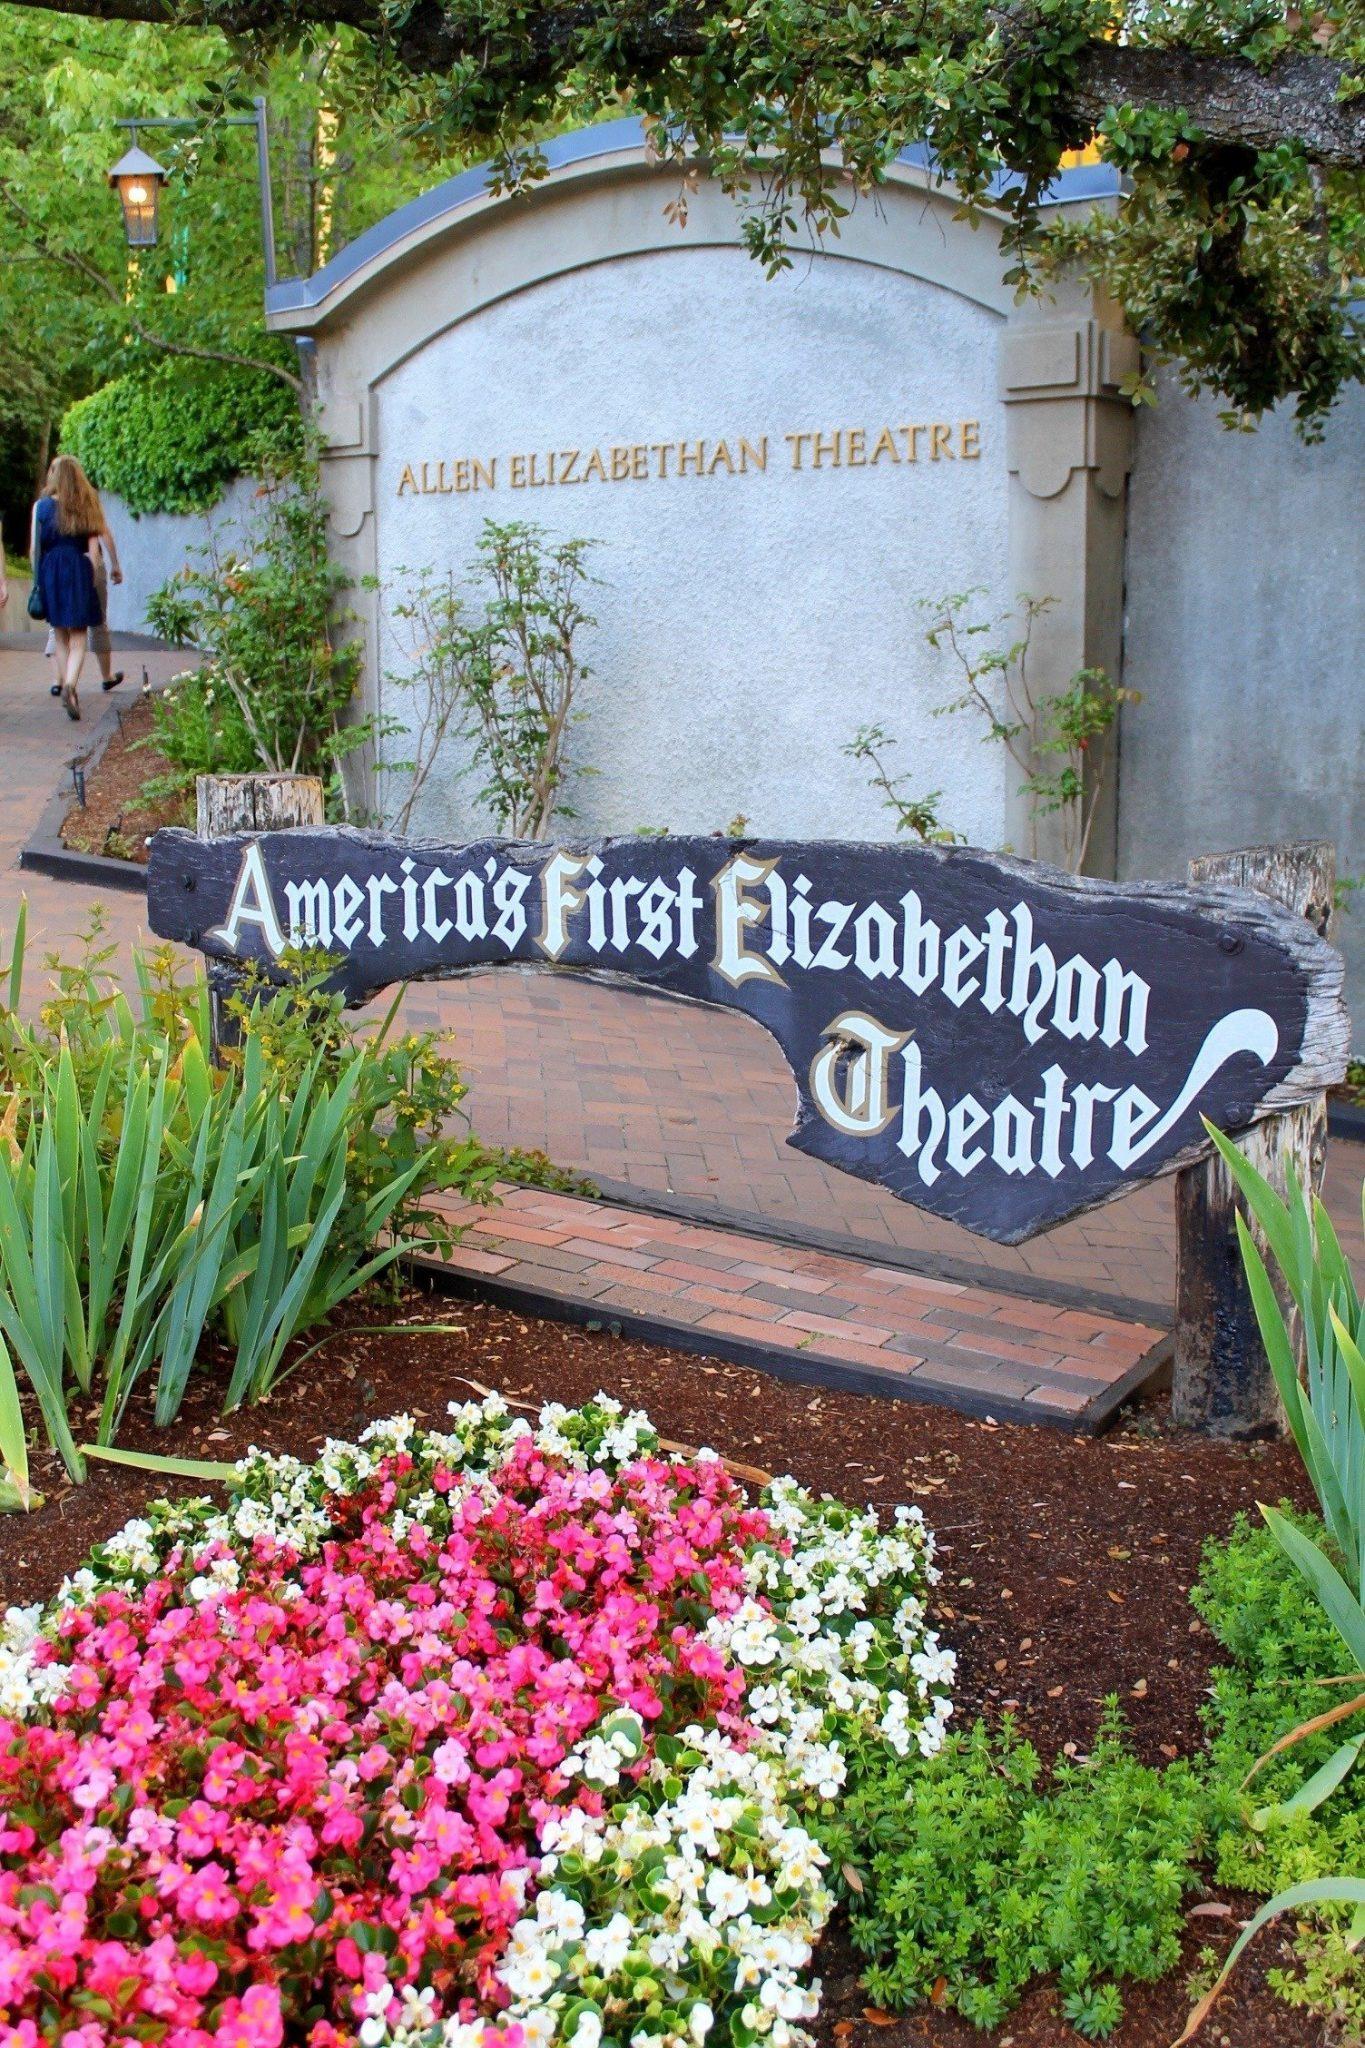 Oregon-Shakespeare-Festival-Elizabethan-Theatre-Ashland